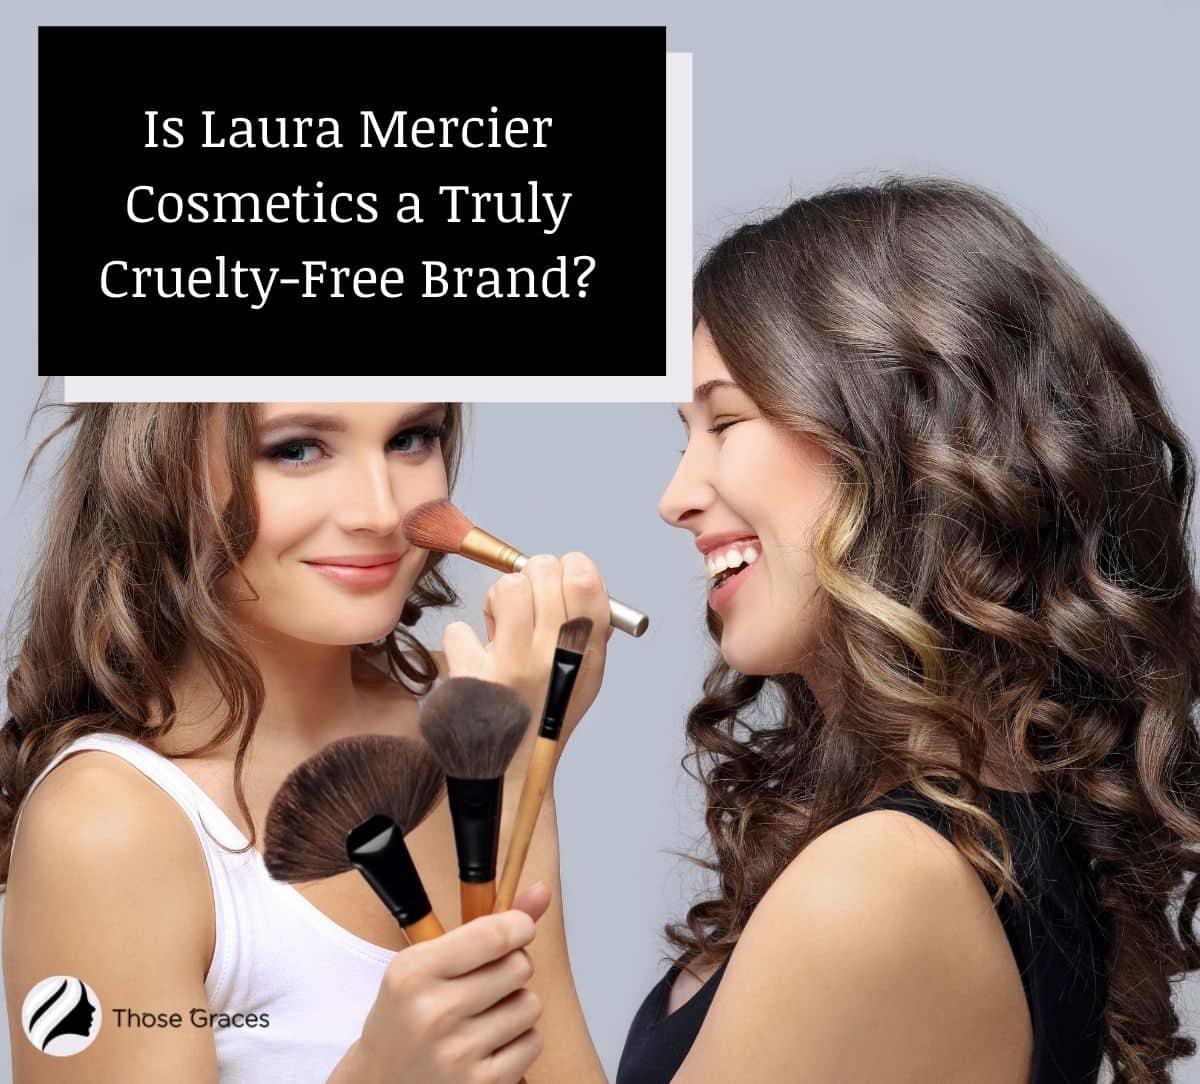 two beautiful ladies putting makeup from Laura Mercier but is Laura Mercier Cruelty free?